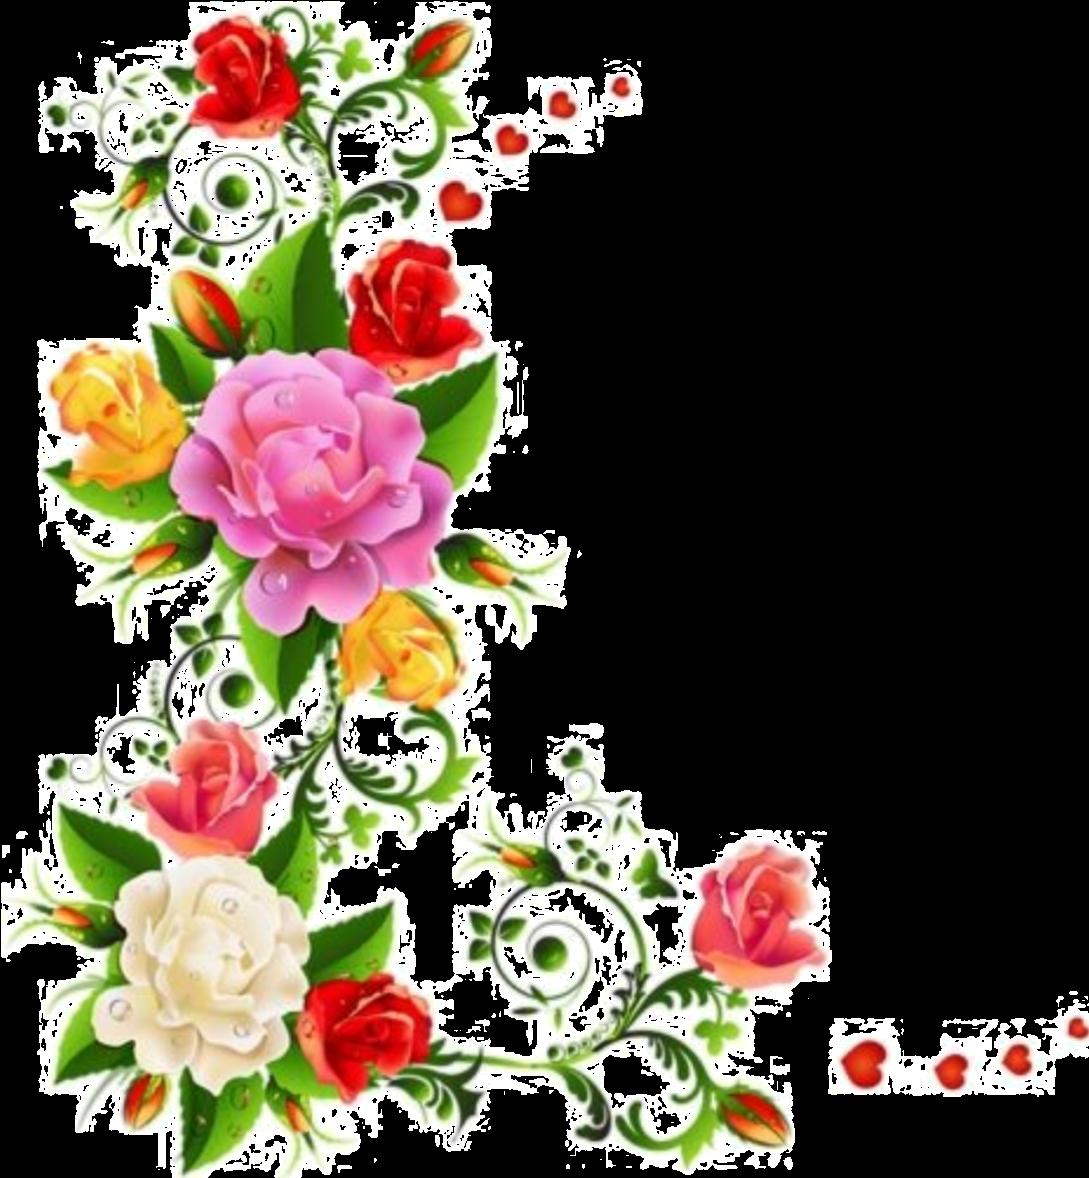 Transparent flower clipart borders - Galería Vintage Wreath, Rose Clipart, Flower Clipart, - Colorful Flower Border Design